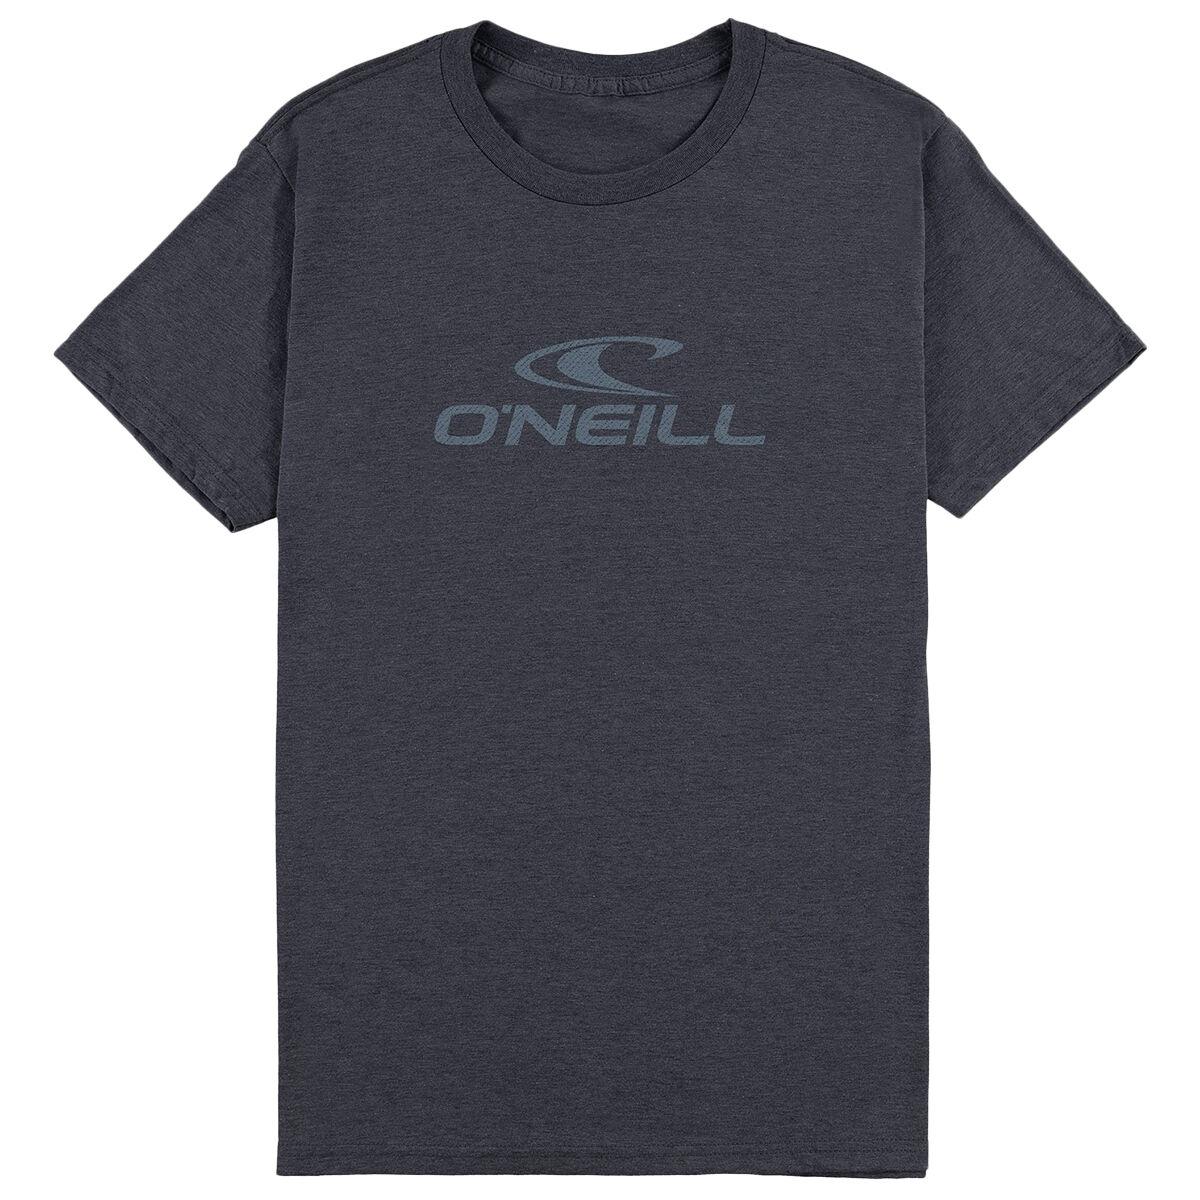 O'neill Men's Supreme Short-Sleeve Tee - Blue, M